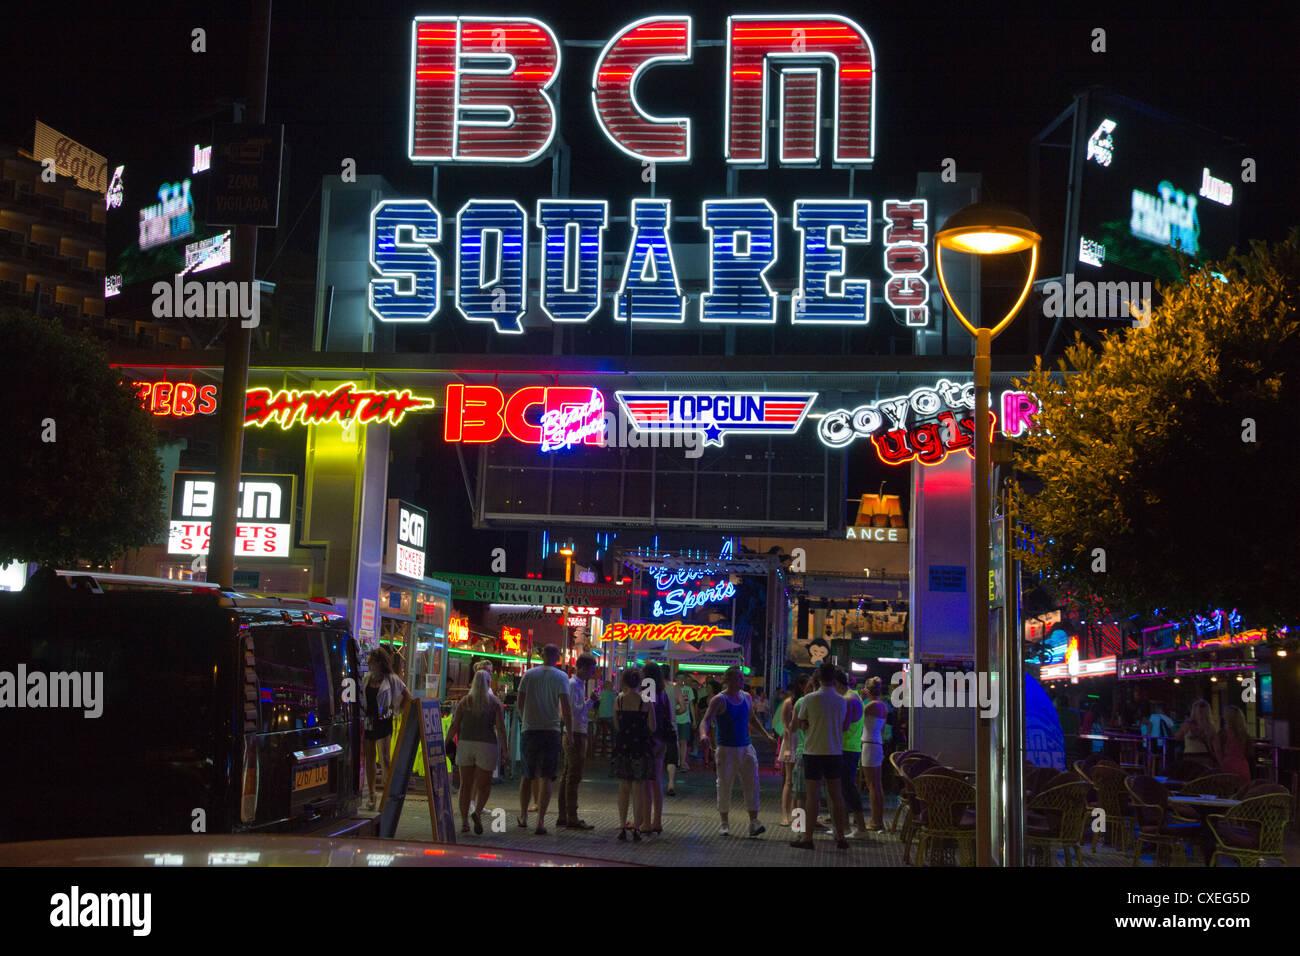 plaza de bcm discoteca firmar magaluf mallorca baleares